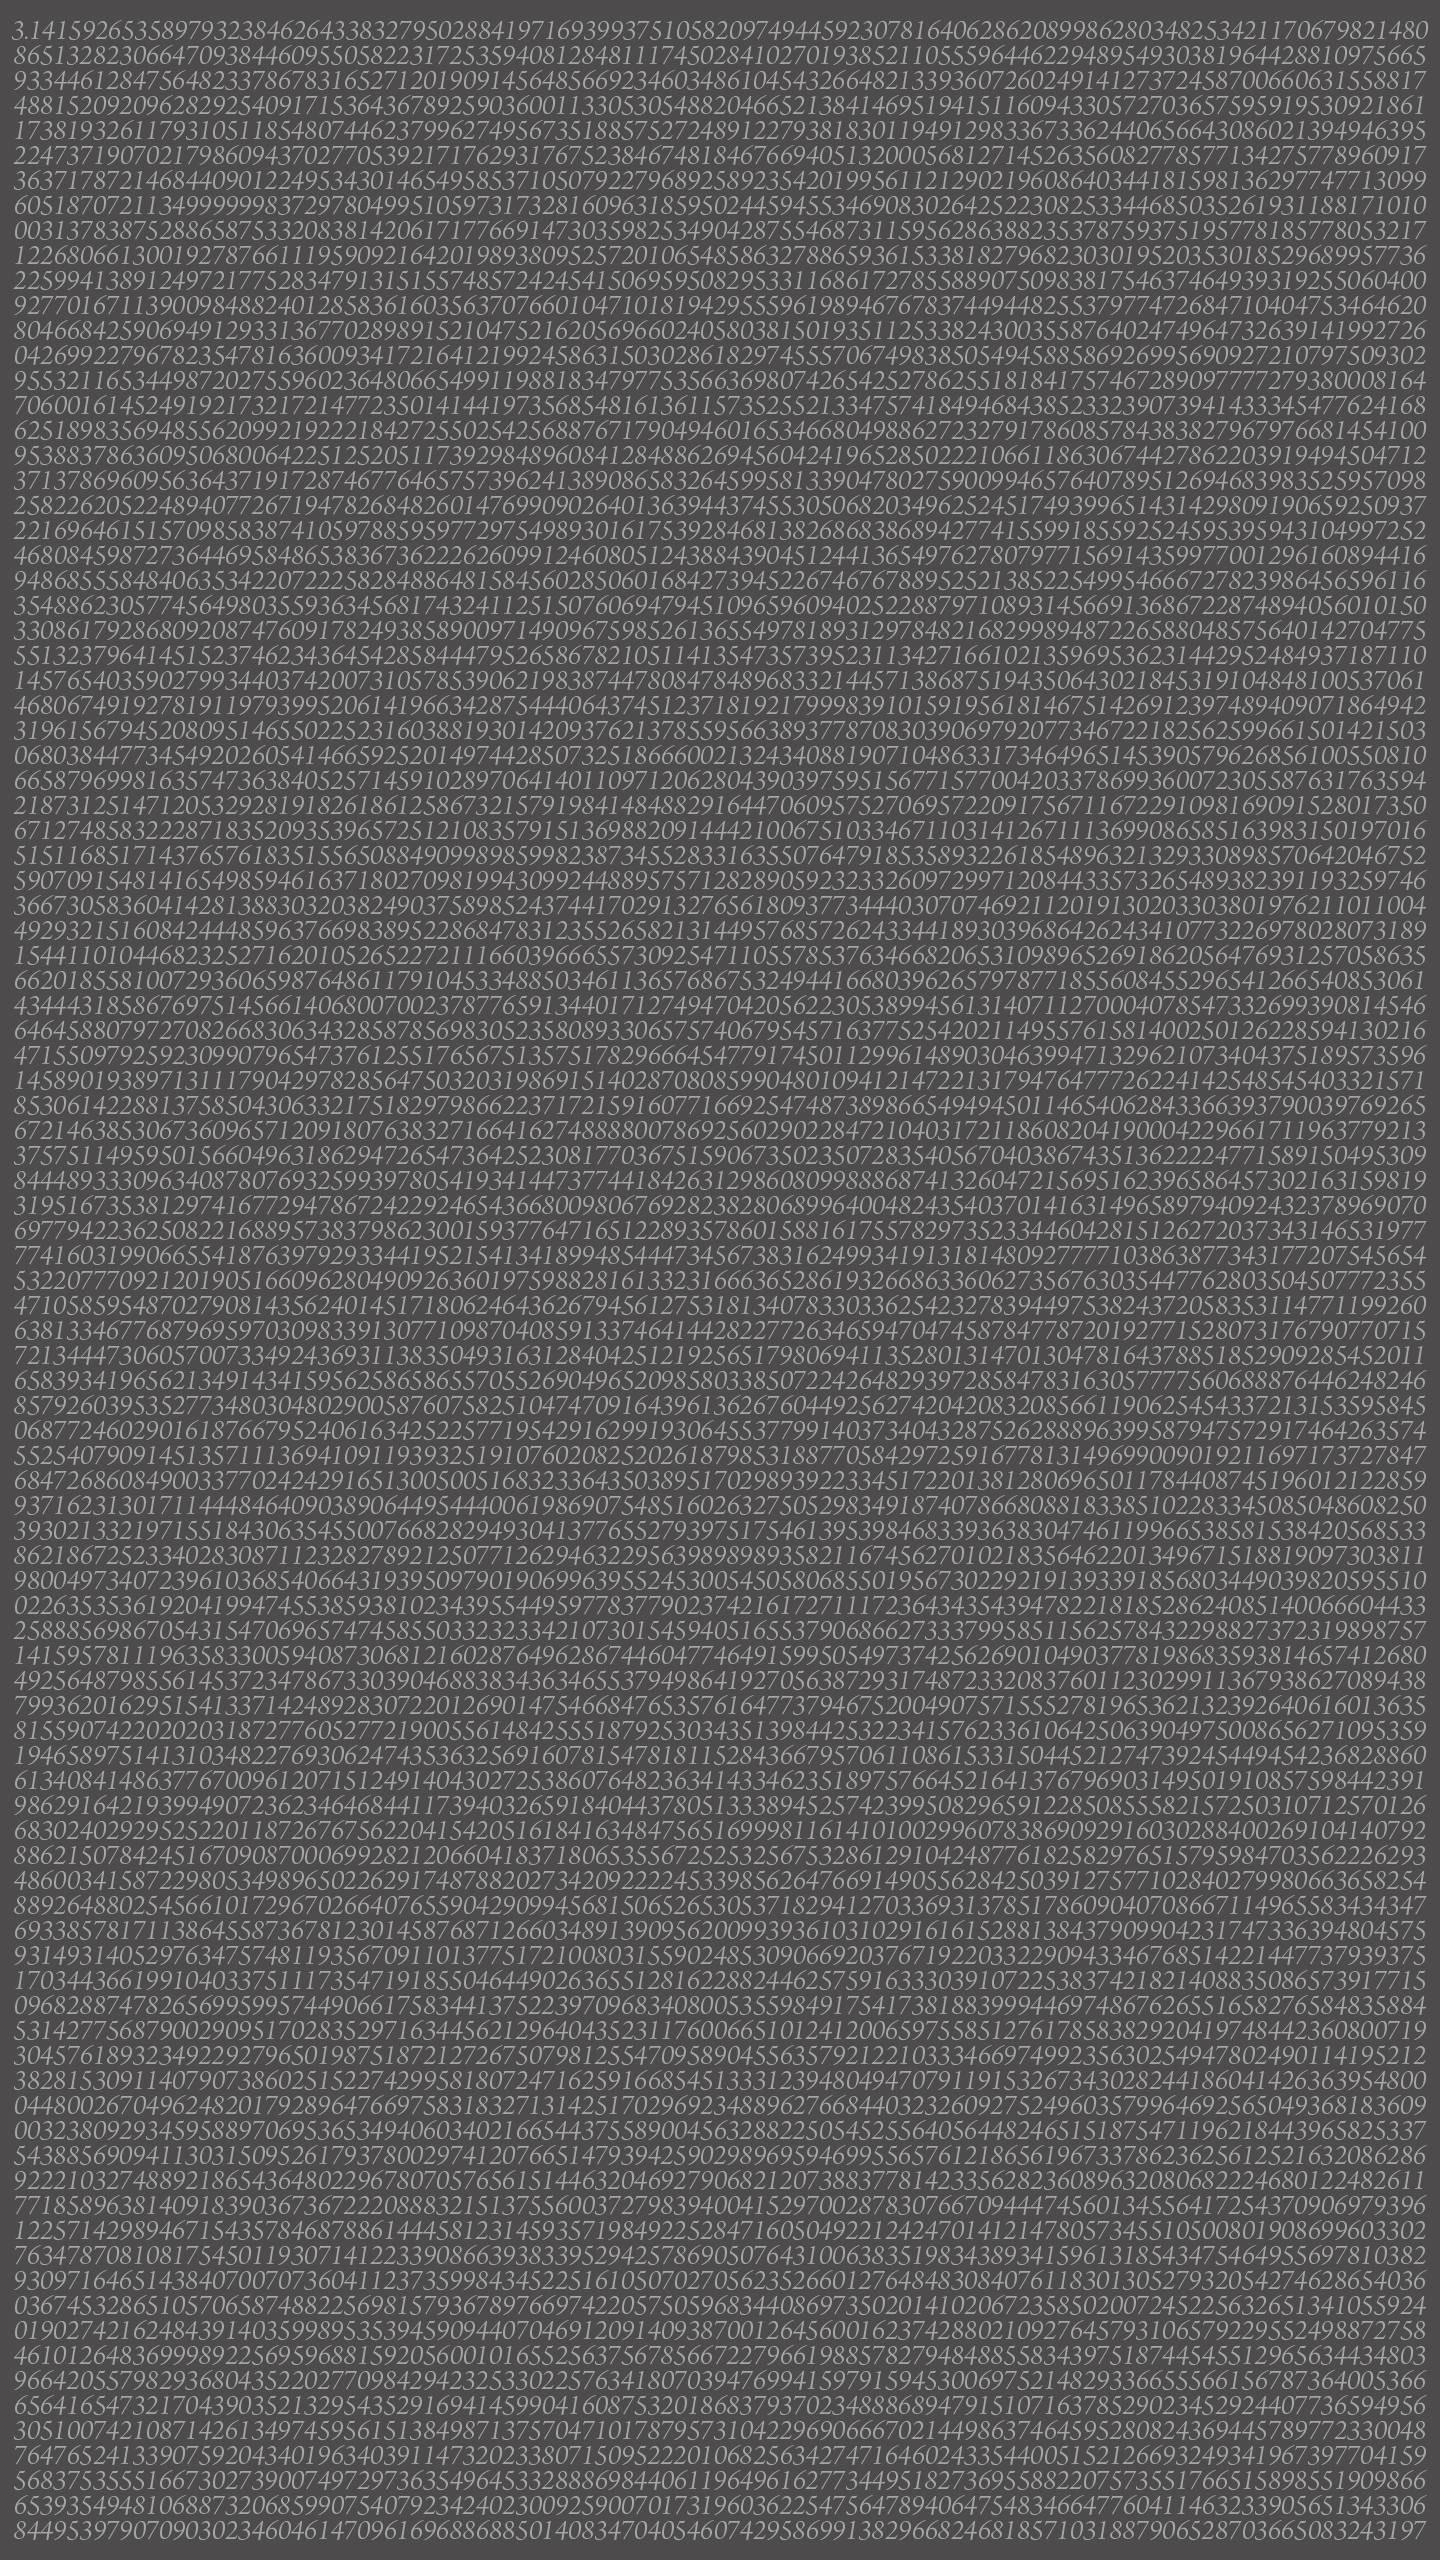 Simplistic phone wallpaper I made… Pi to 10807 digits. [1440×2560]